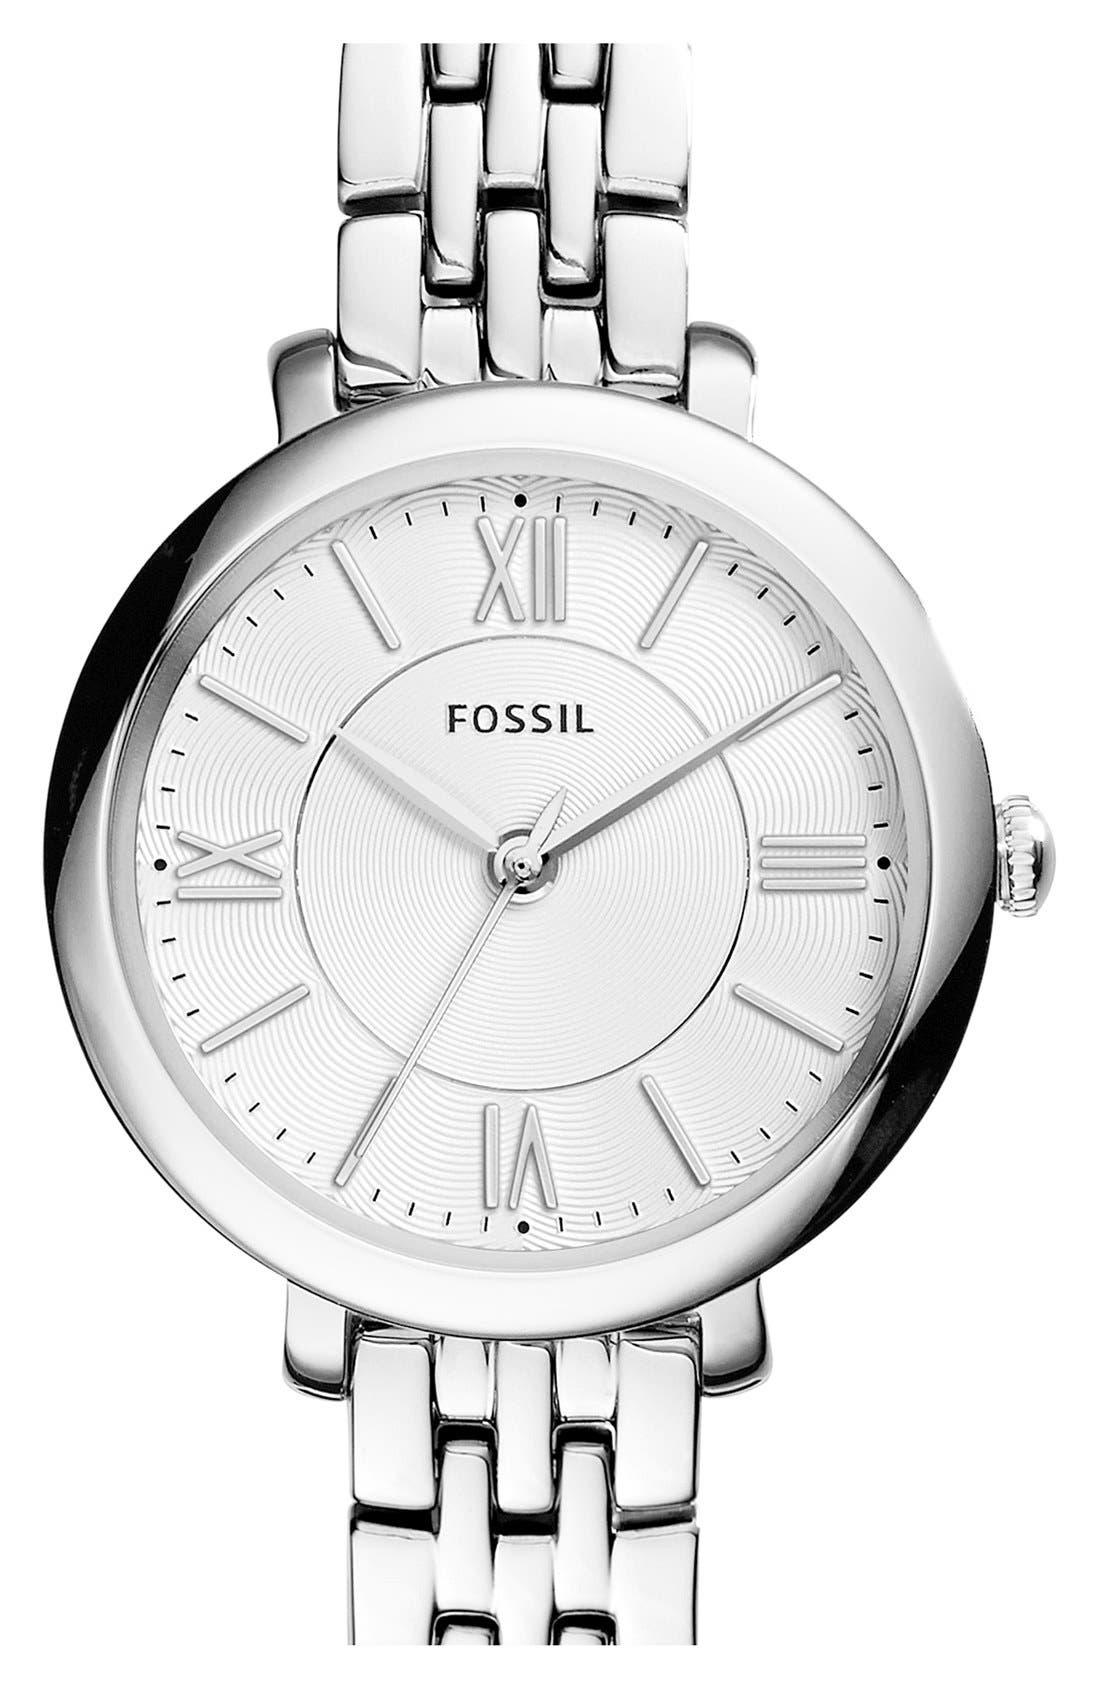 FOSSIL, 'Jacqueline' Round Bracelet Watch, 26mm, Main thumbnail 1, color, SILVER